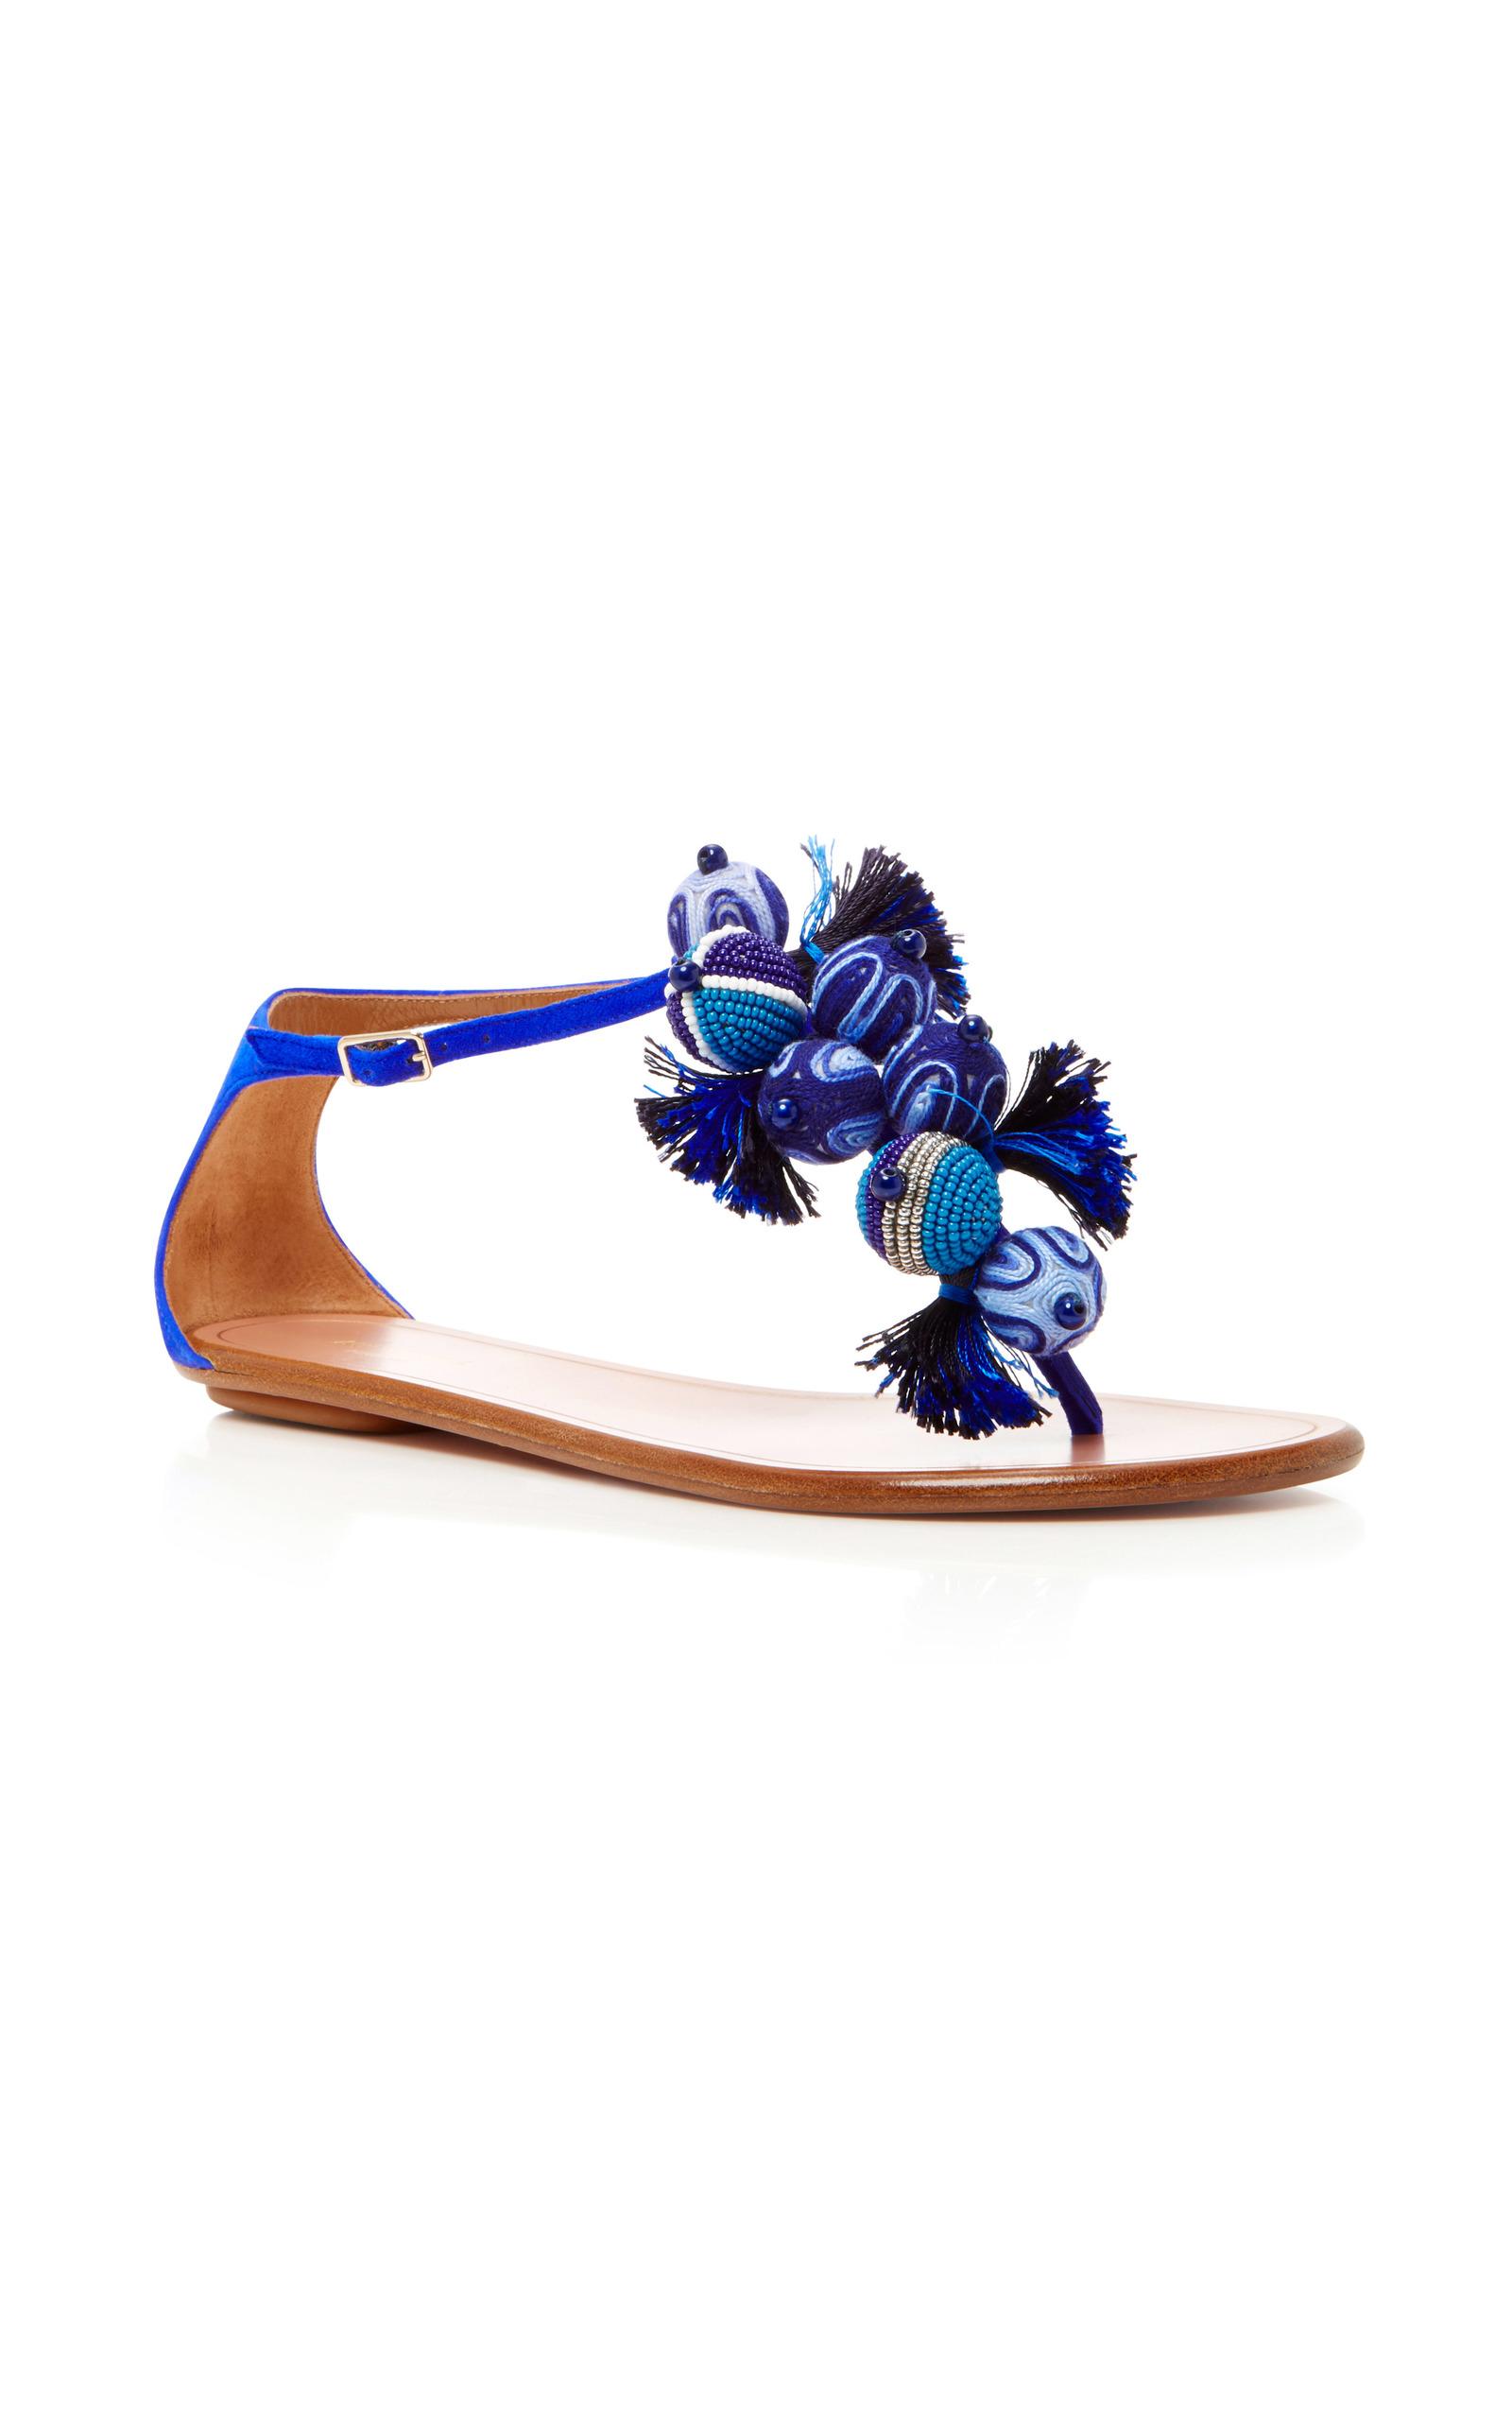 Tropicana Embellished Suede Sandals